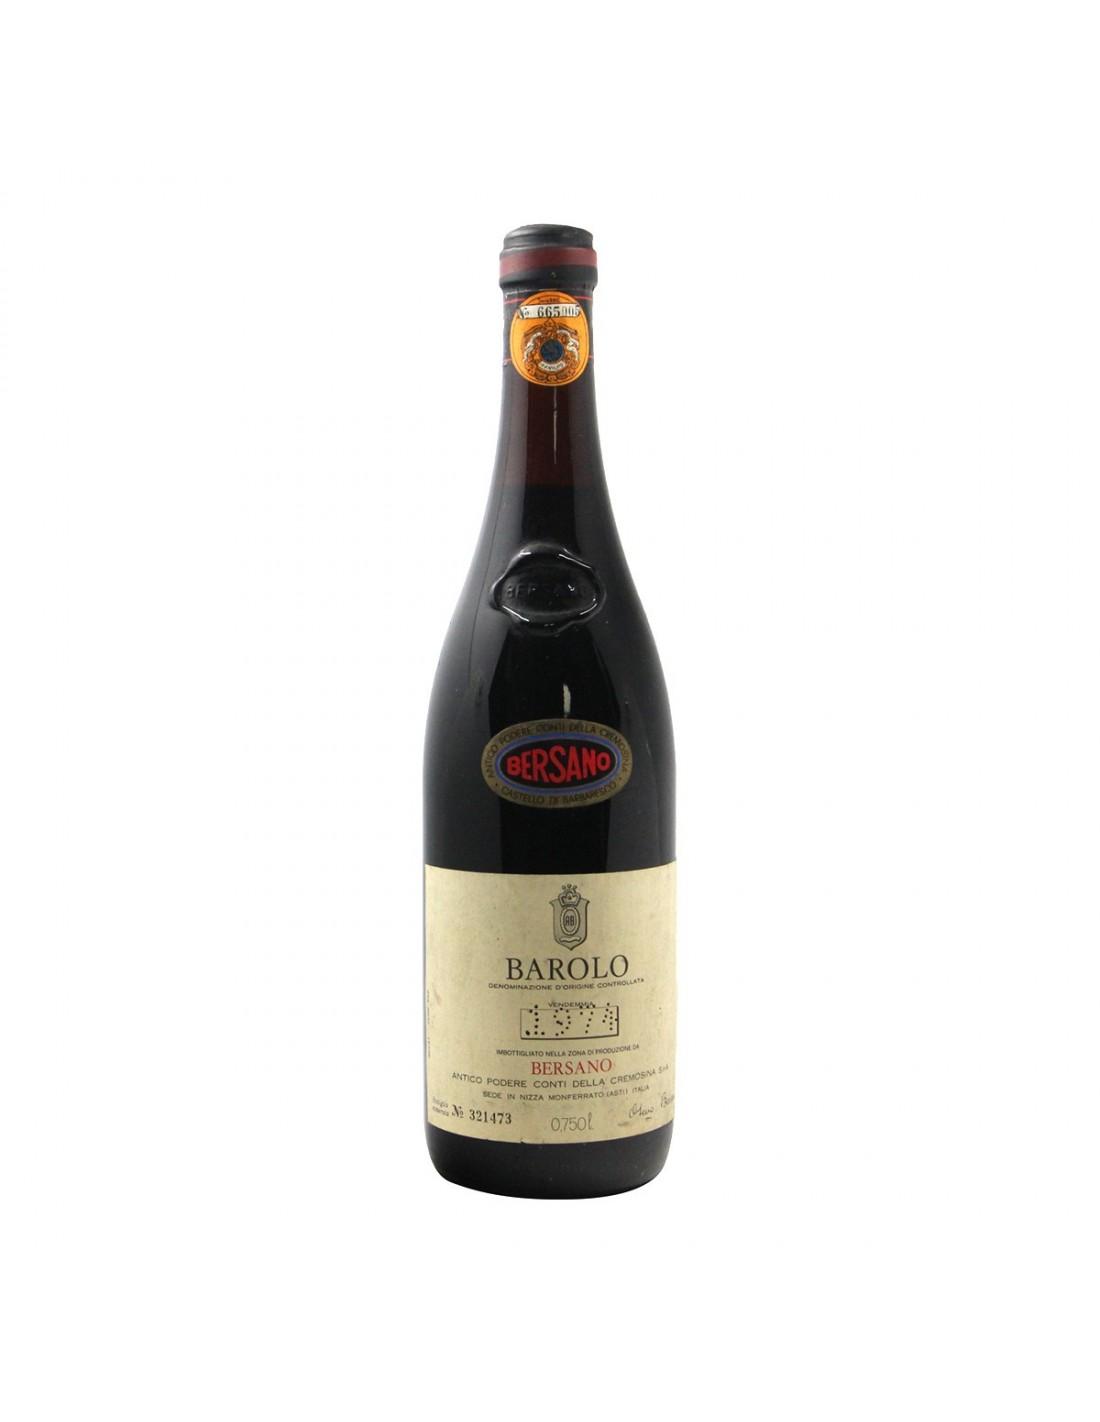 BAROLO 1974 BERSANO Grandi Bottiglie